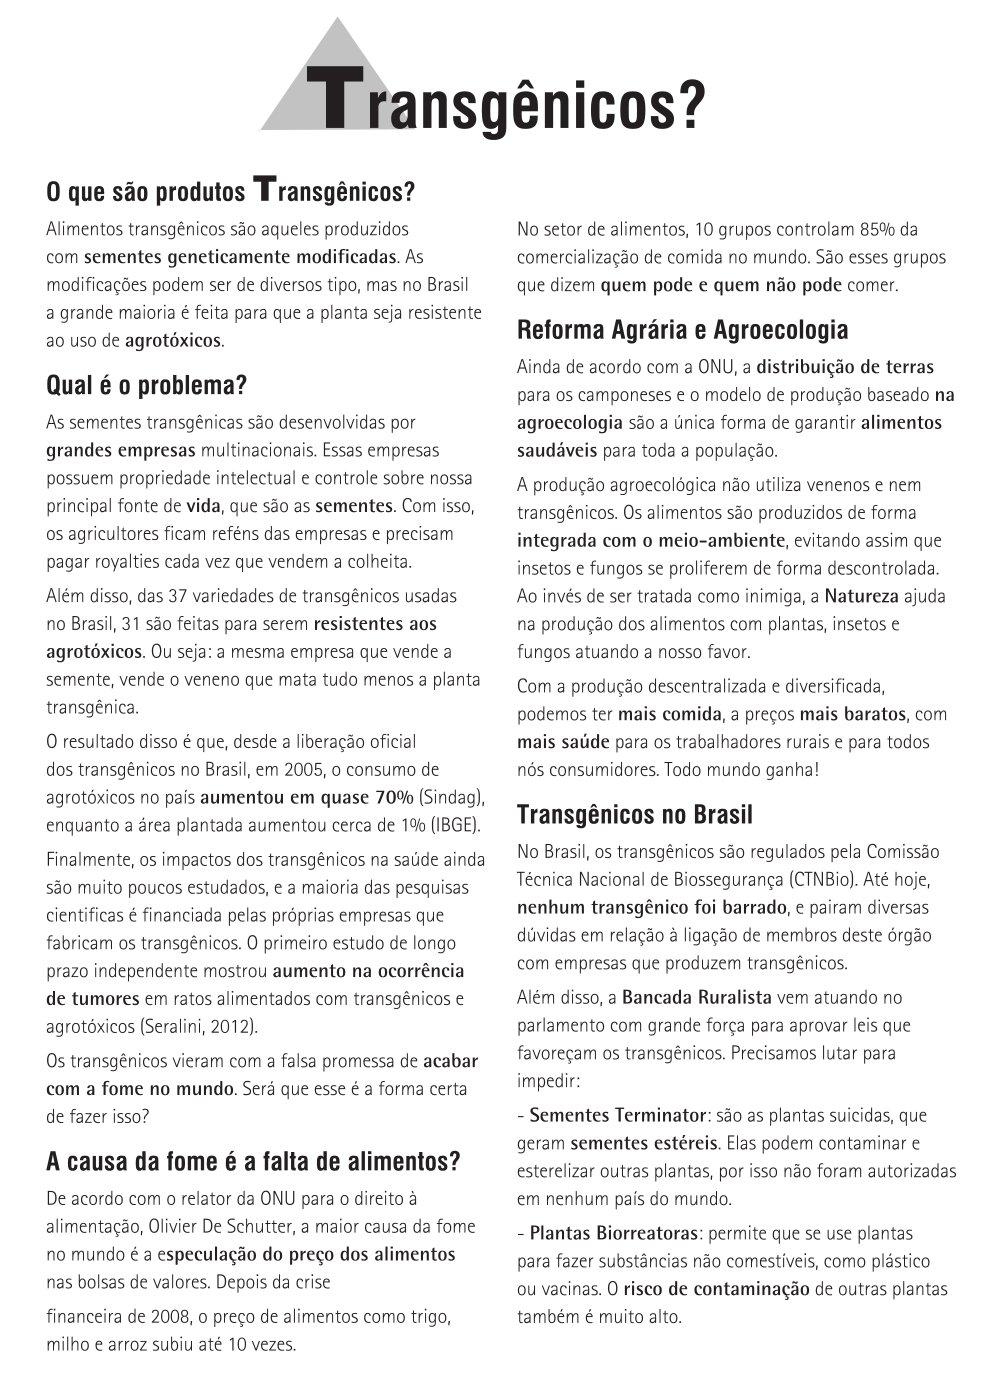 panfleto-pagina1.jpg